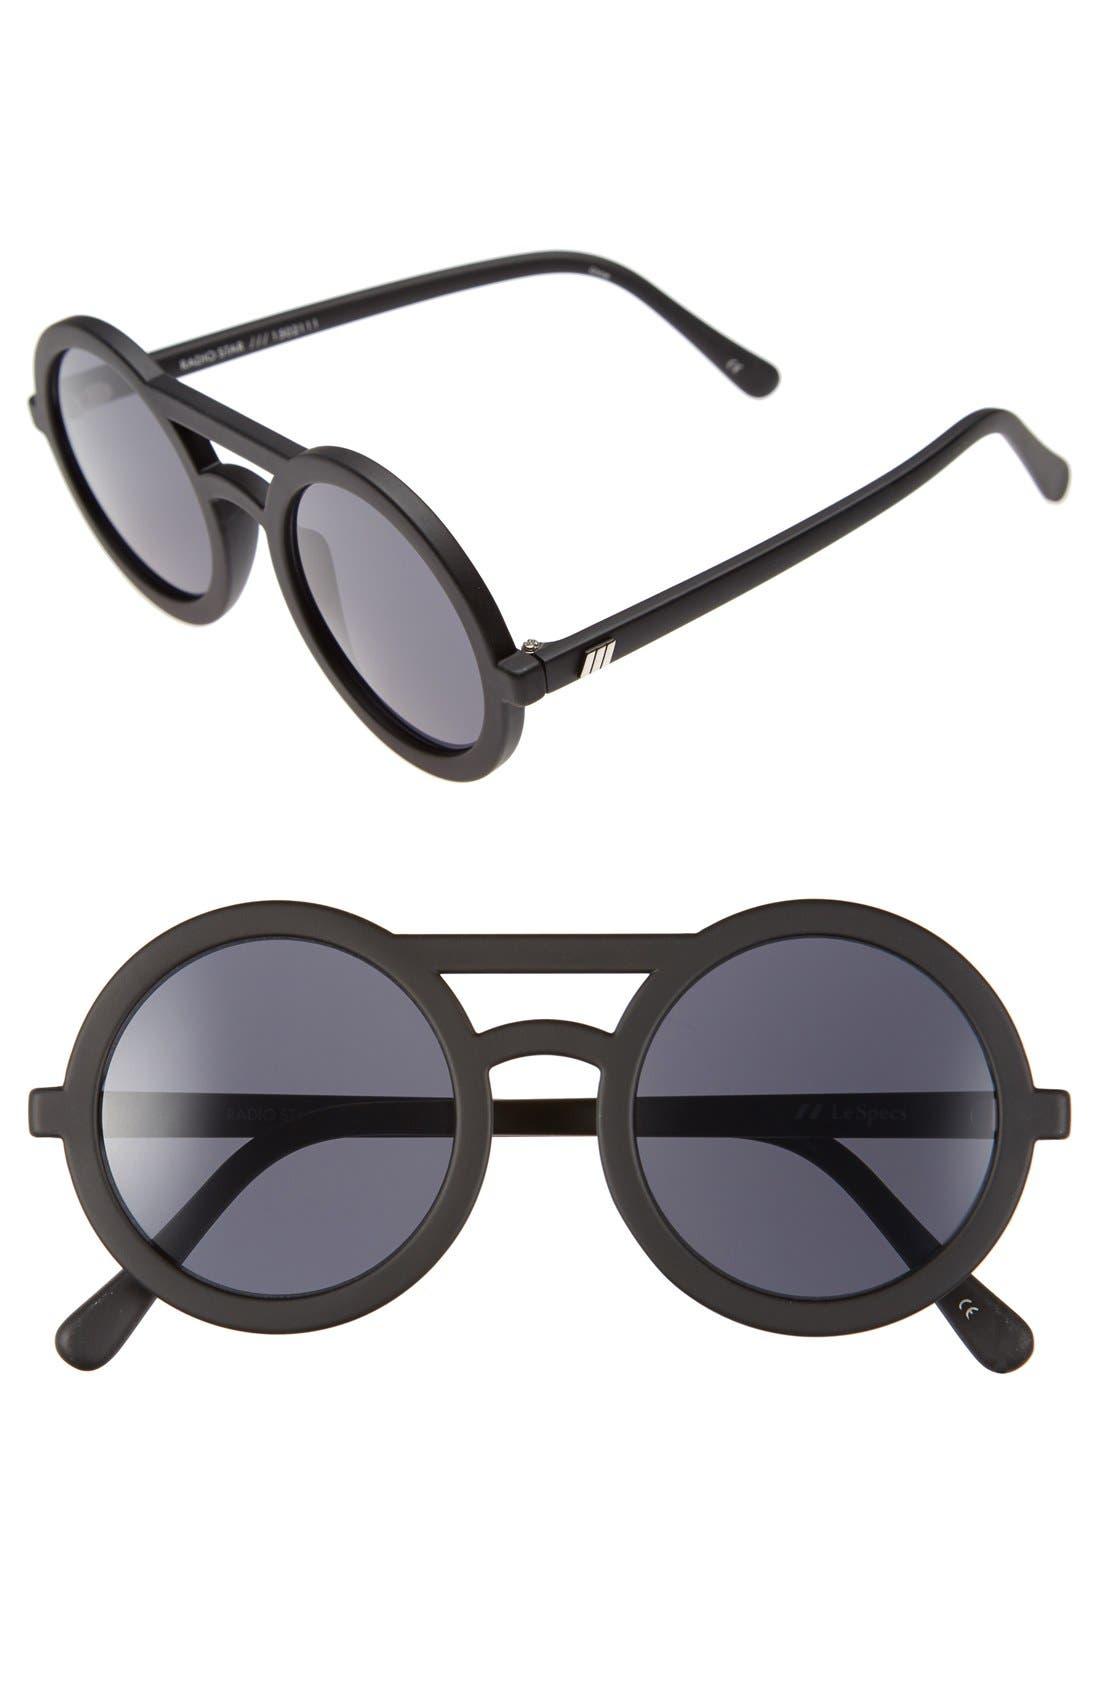 Main Image - Le Specs 'Radio Star' 50mm Round Sunglasses